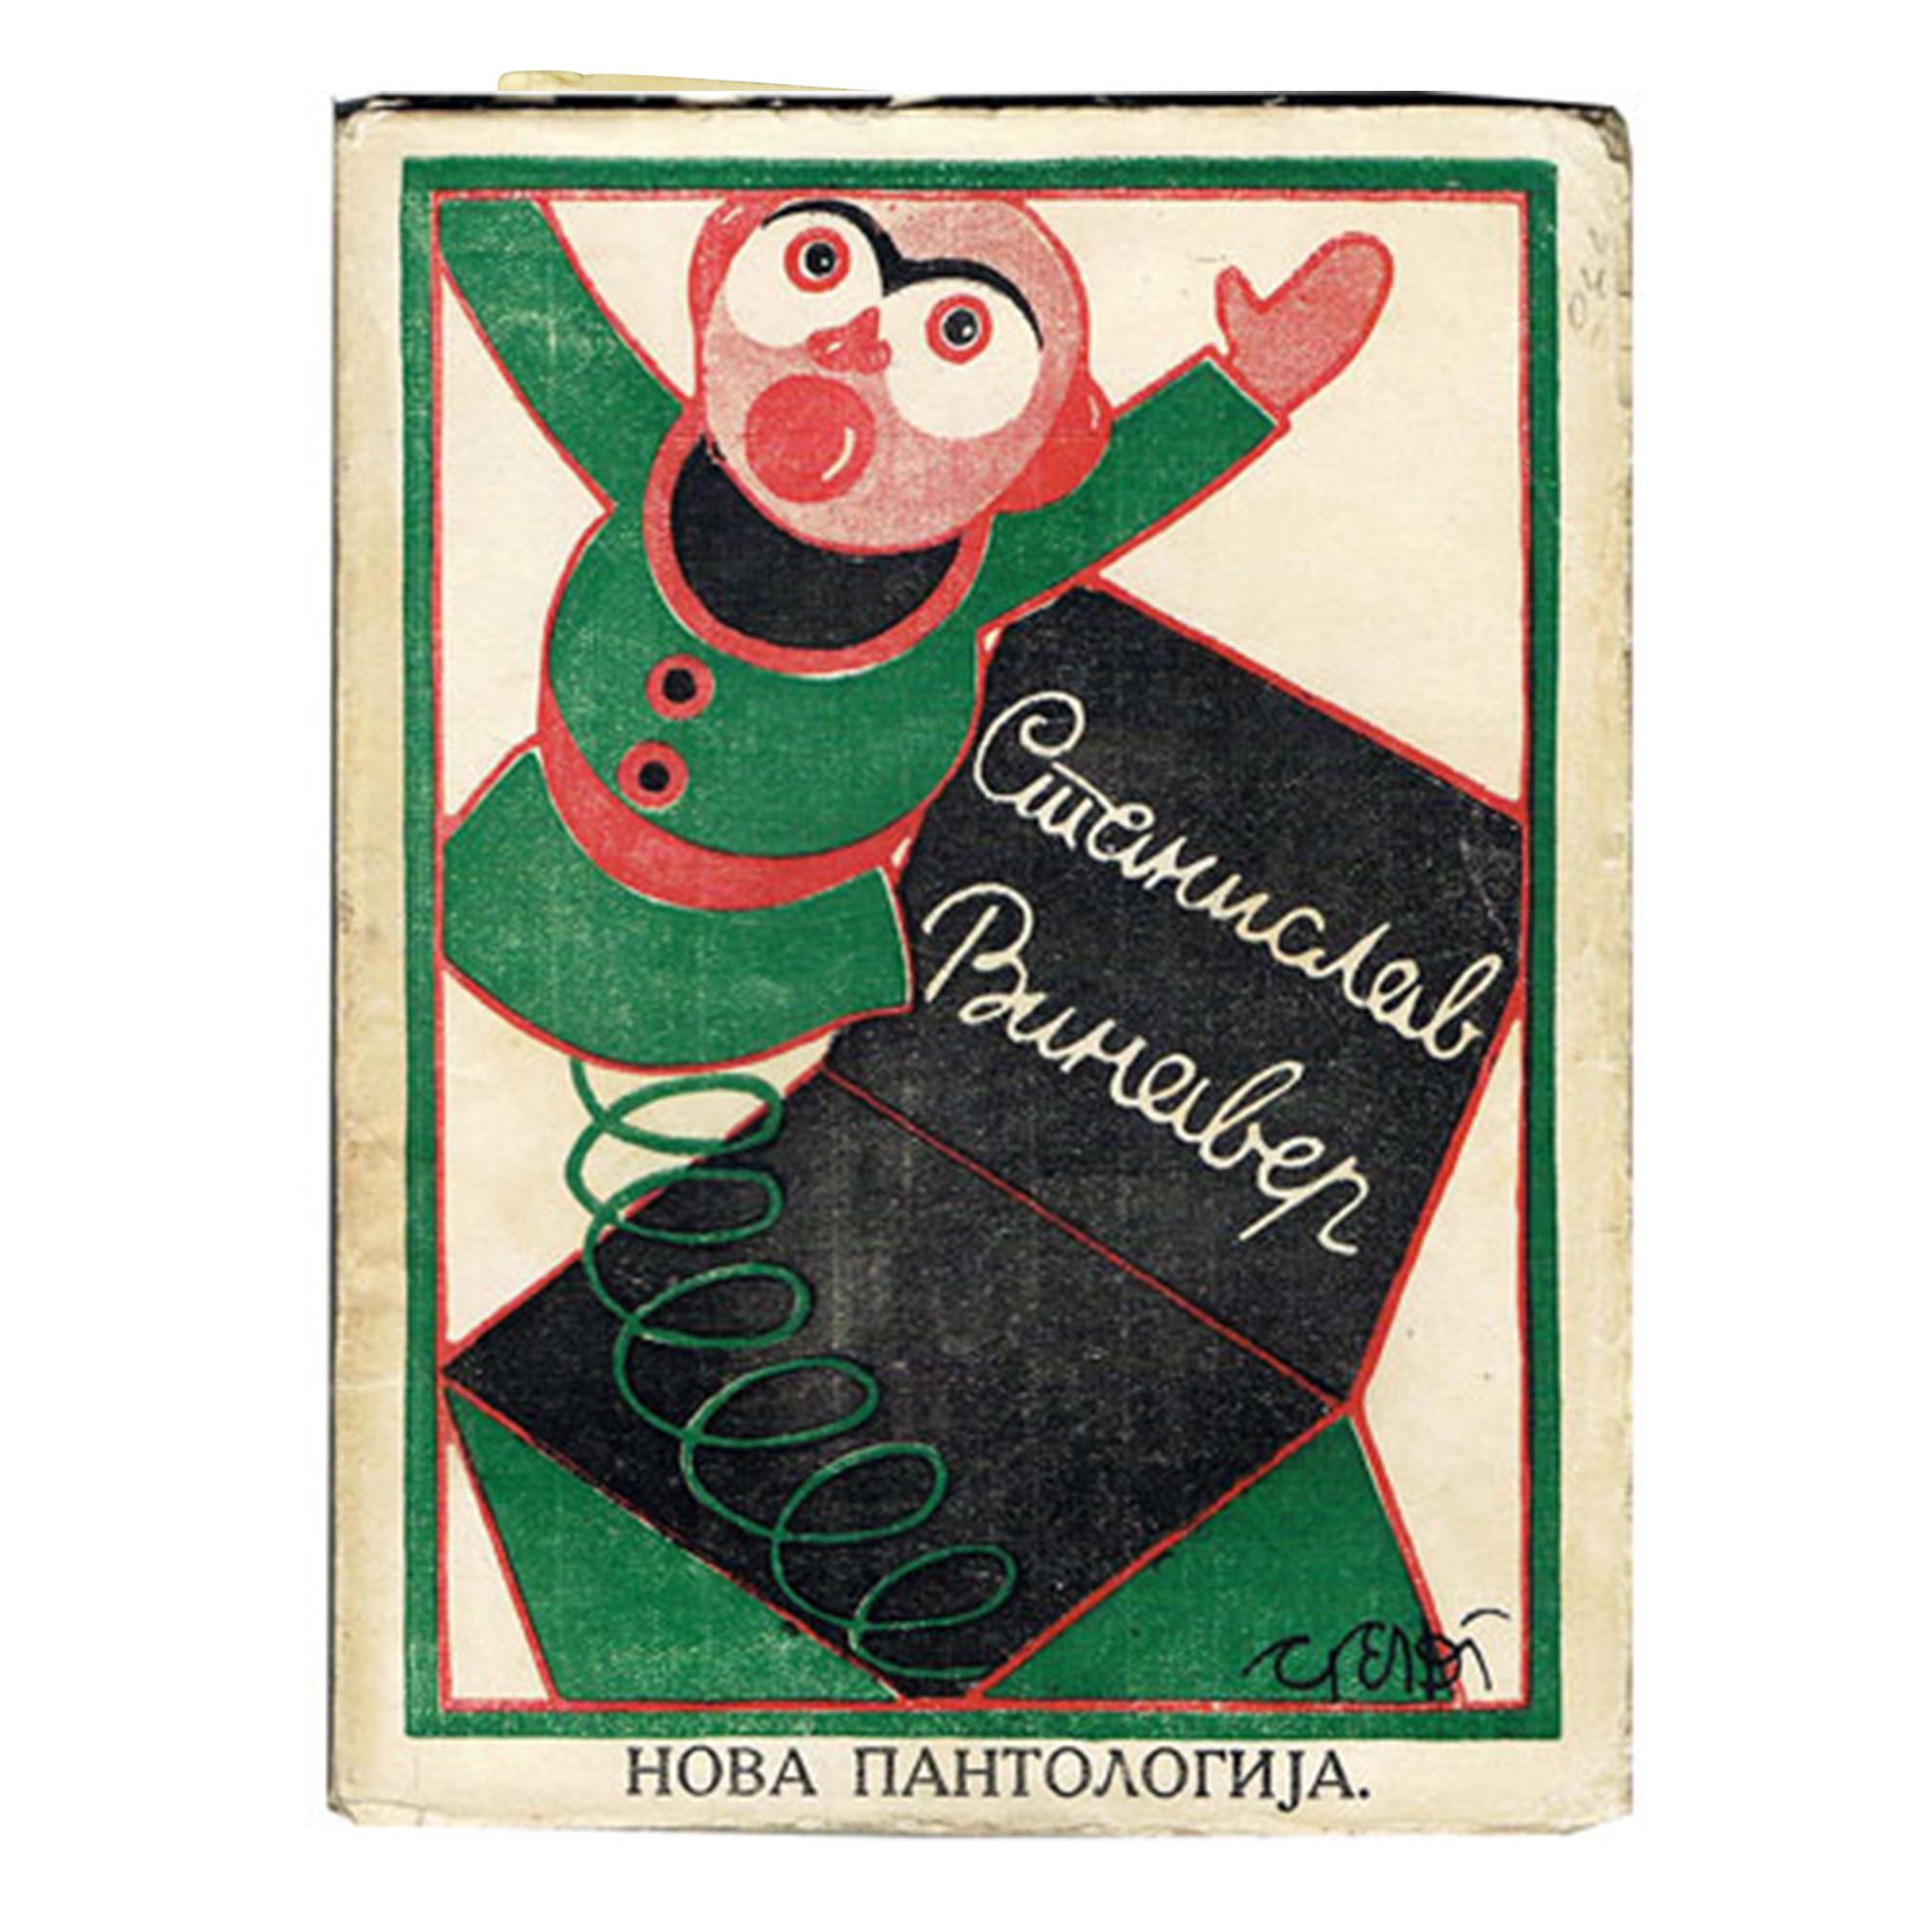 1190-vinaver-nova-pantologija-1922.jpg